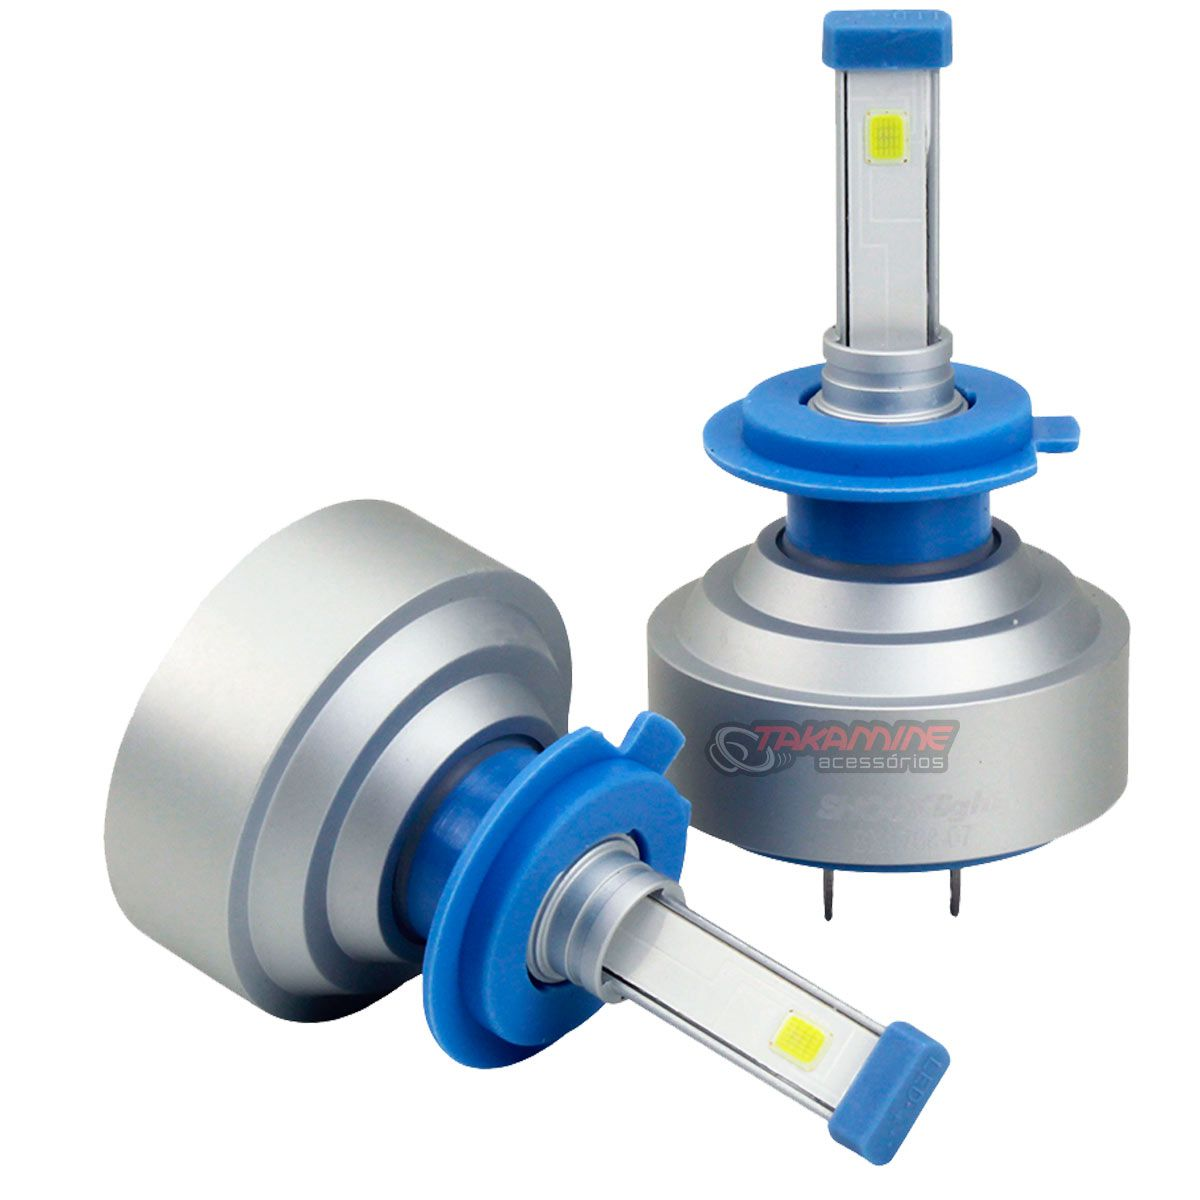 Kit LED tipo xenon modelo H7 35W encaixe original plug & play New Headlight